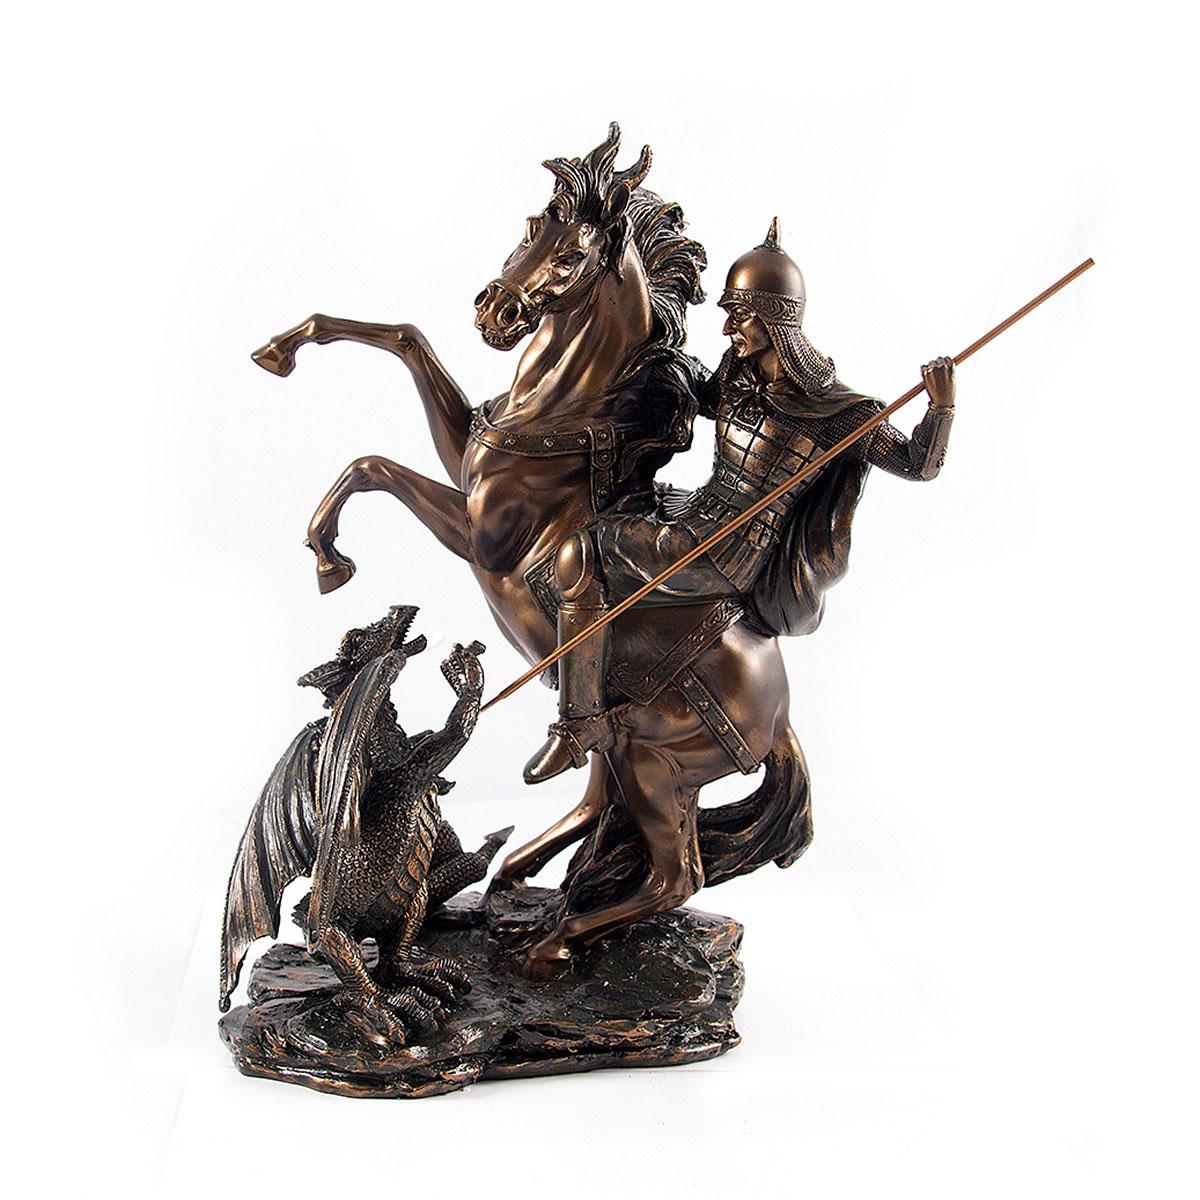 Статуэтка Русские Подарки Архангел Михаил, 28 х 36 см статуэтка русские подарки африканка 11 х 15 х 24 см